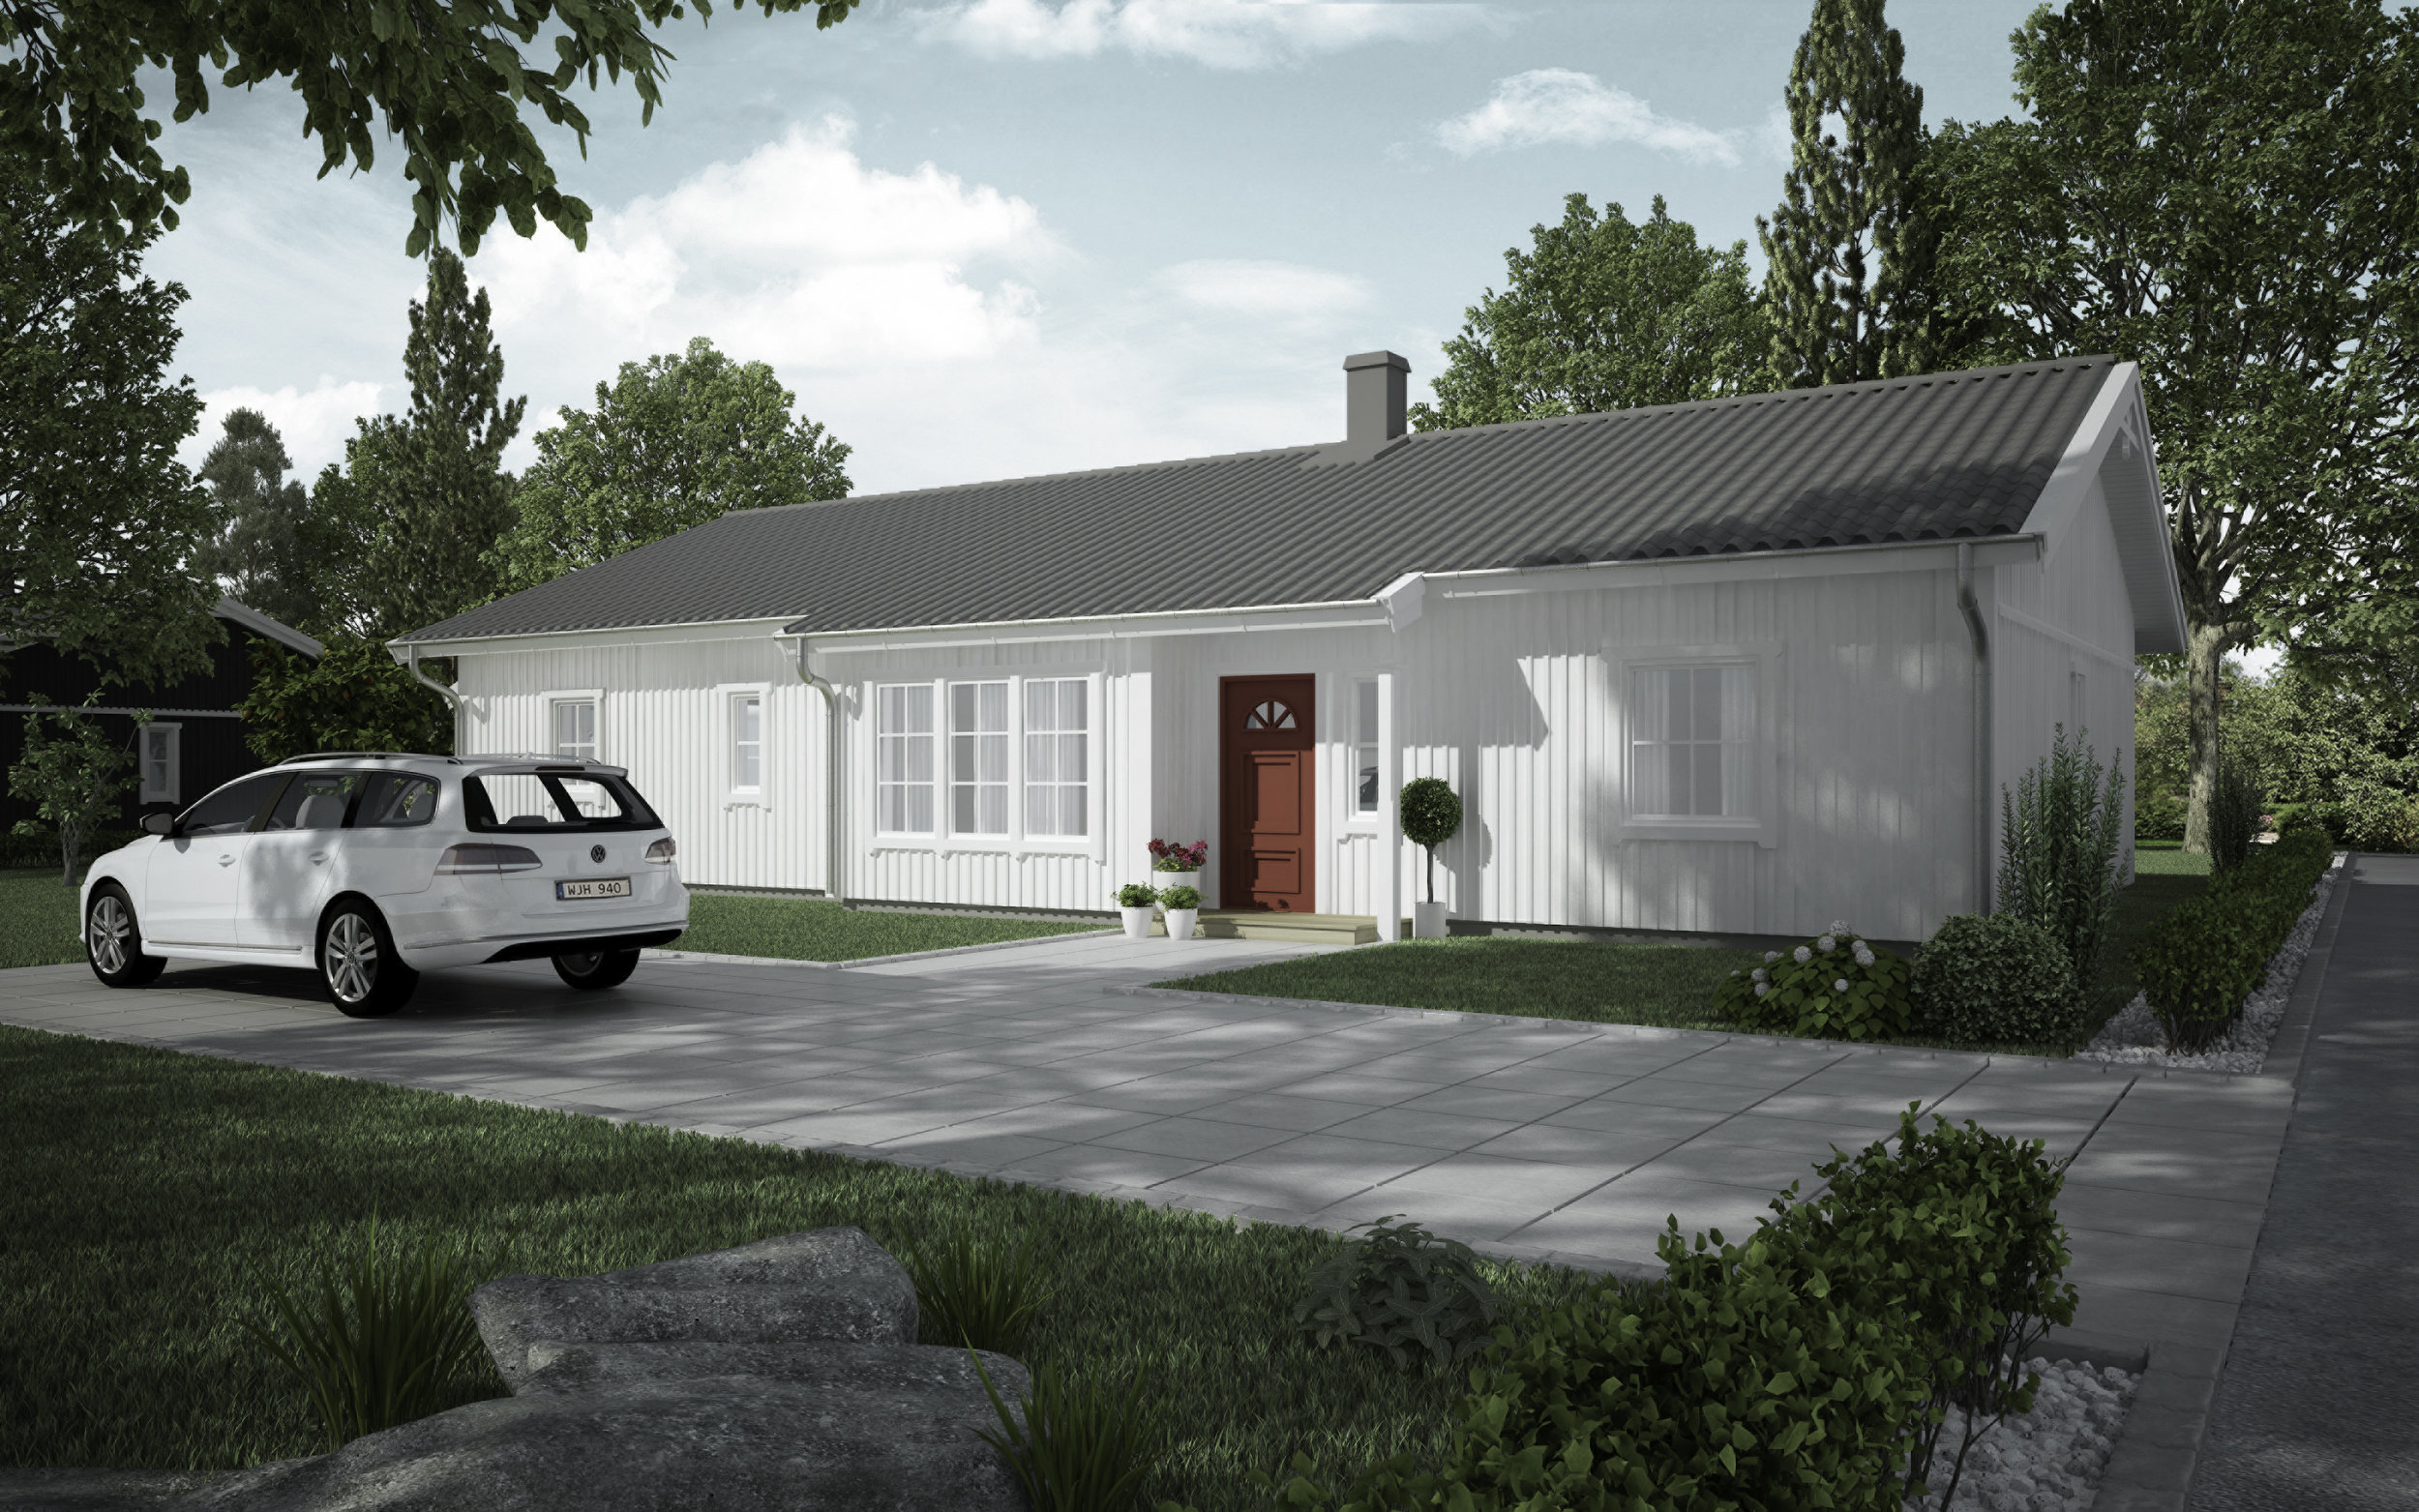 VILLA LÖVÅS  1-planshus Boyta: 143,6 m2 3 sovrum